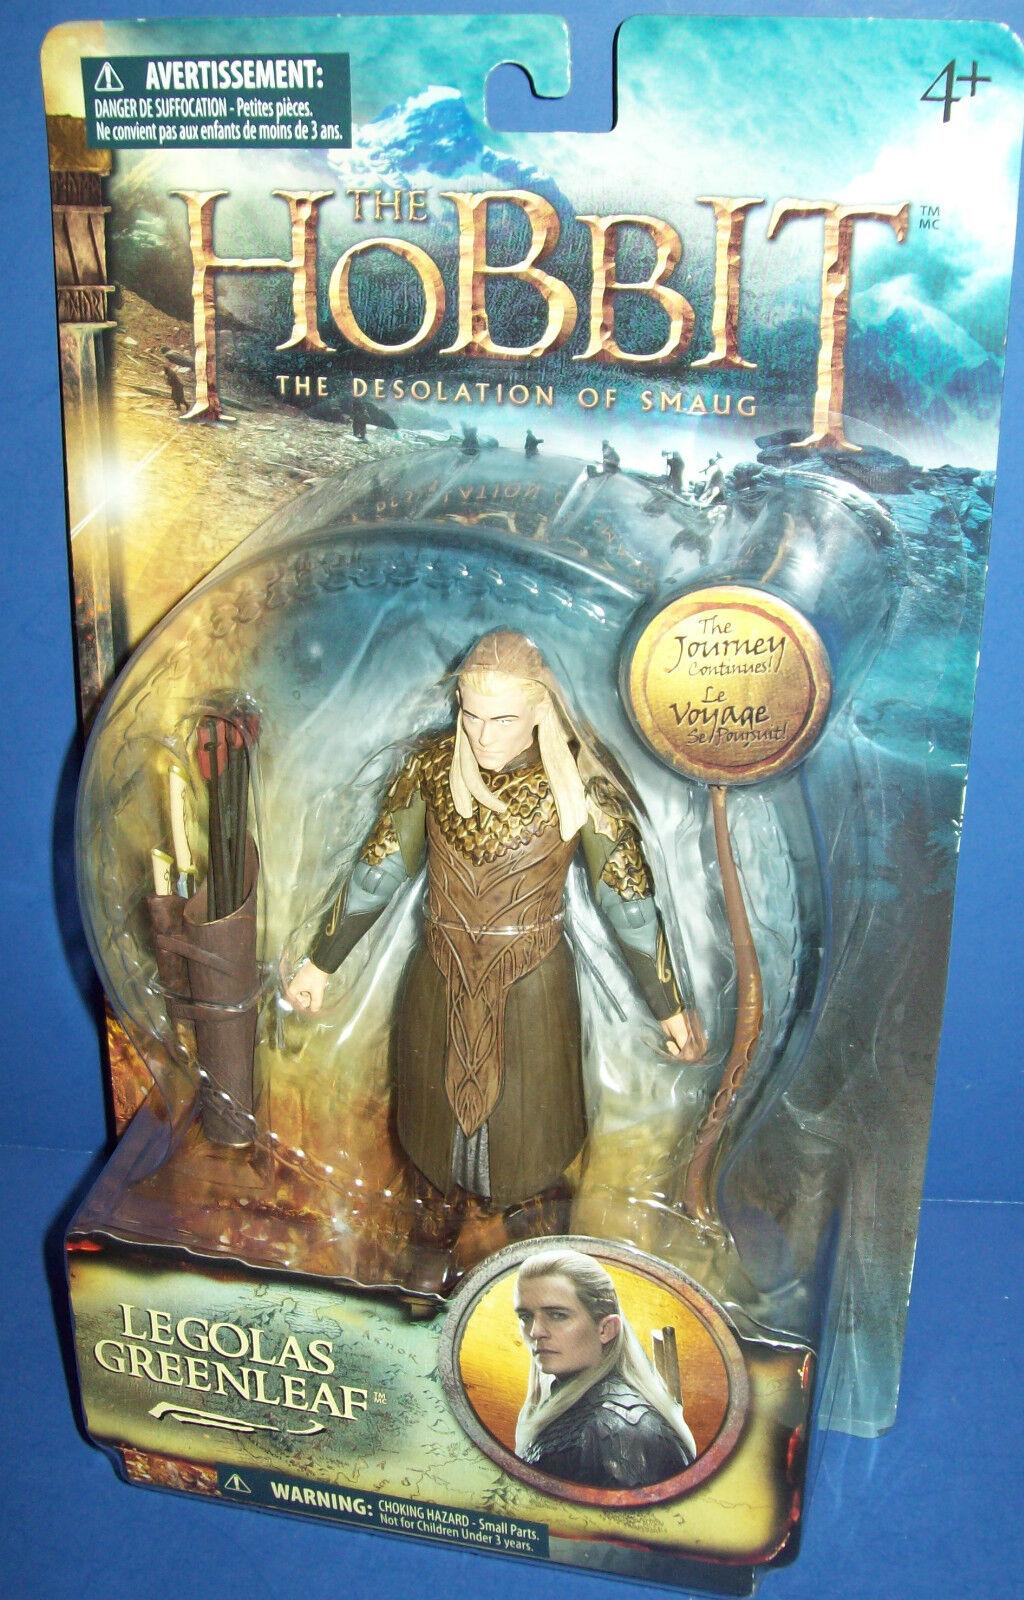 The Hobbit Desolation of Smaug - LEGOLAS GREENLEAF figure New factory sealed